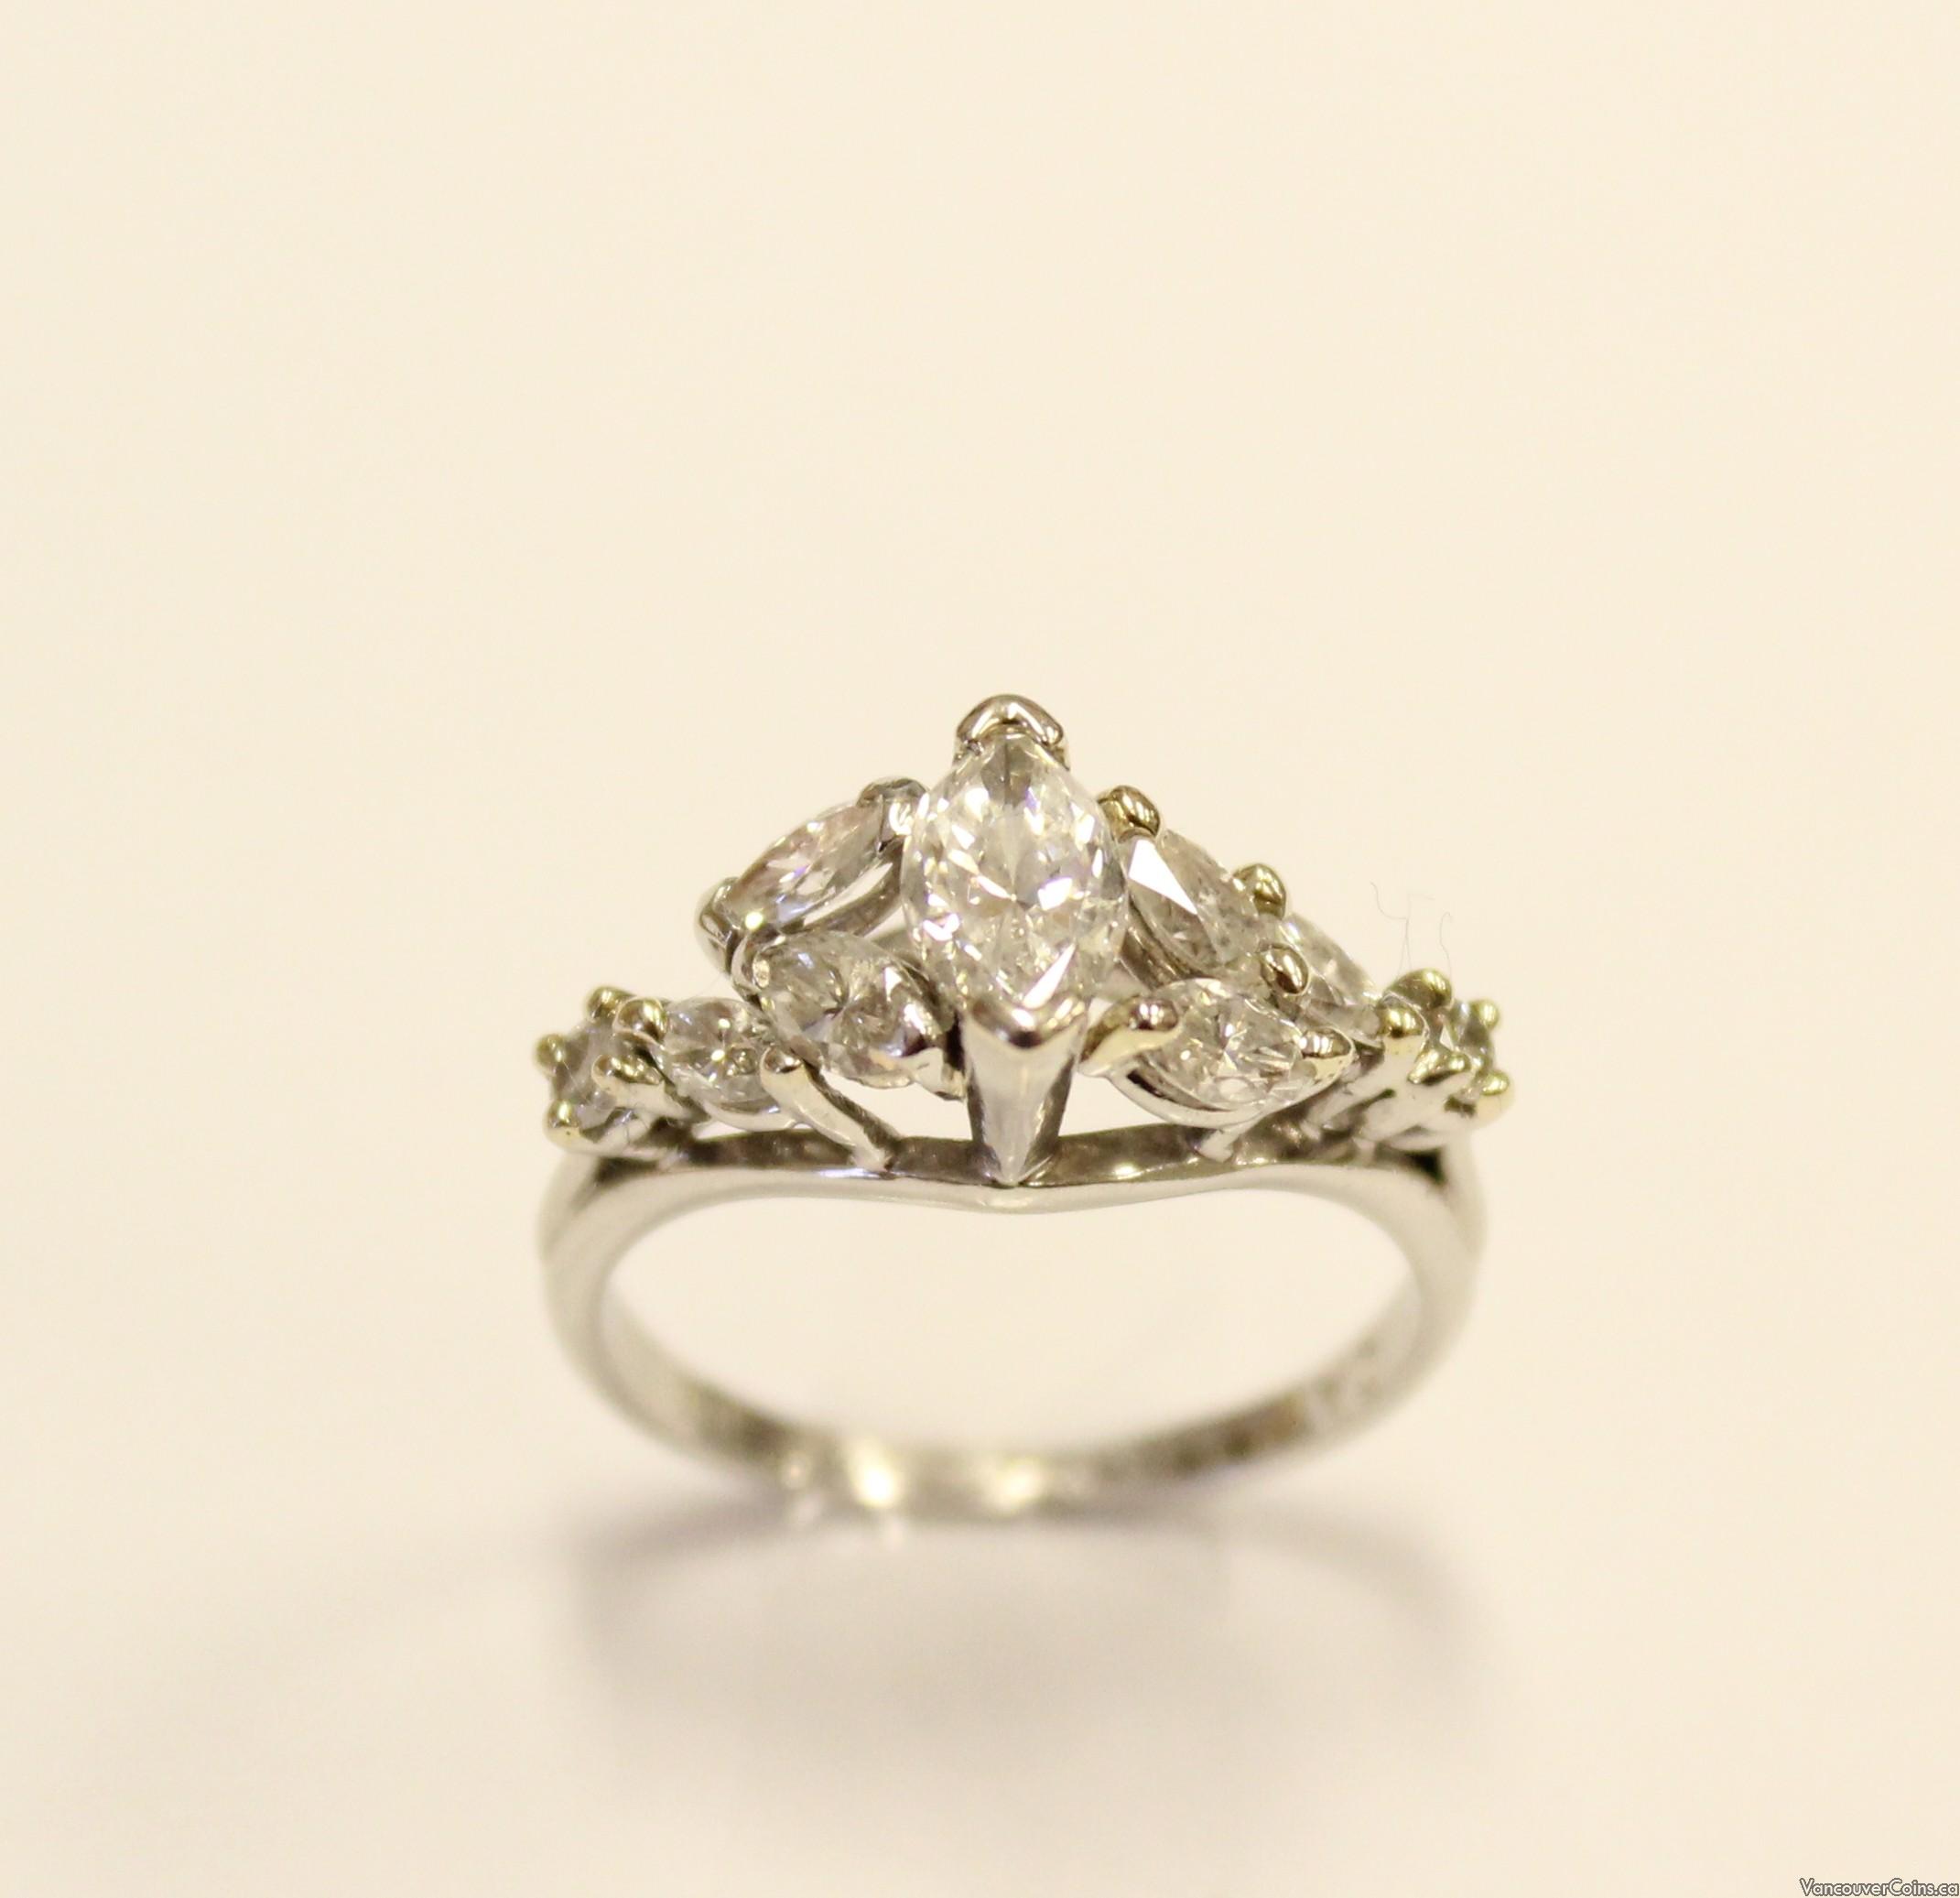 CAVELTI Platinum ring + 1.26ct tcw Marquis Diamonds VVS/VS G/H